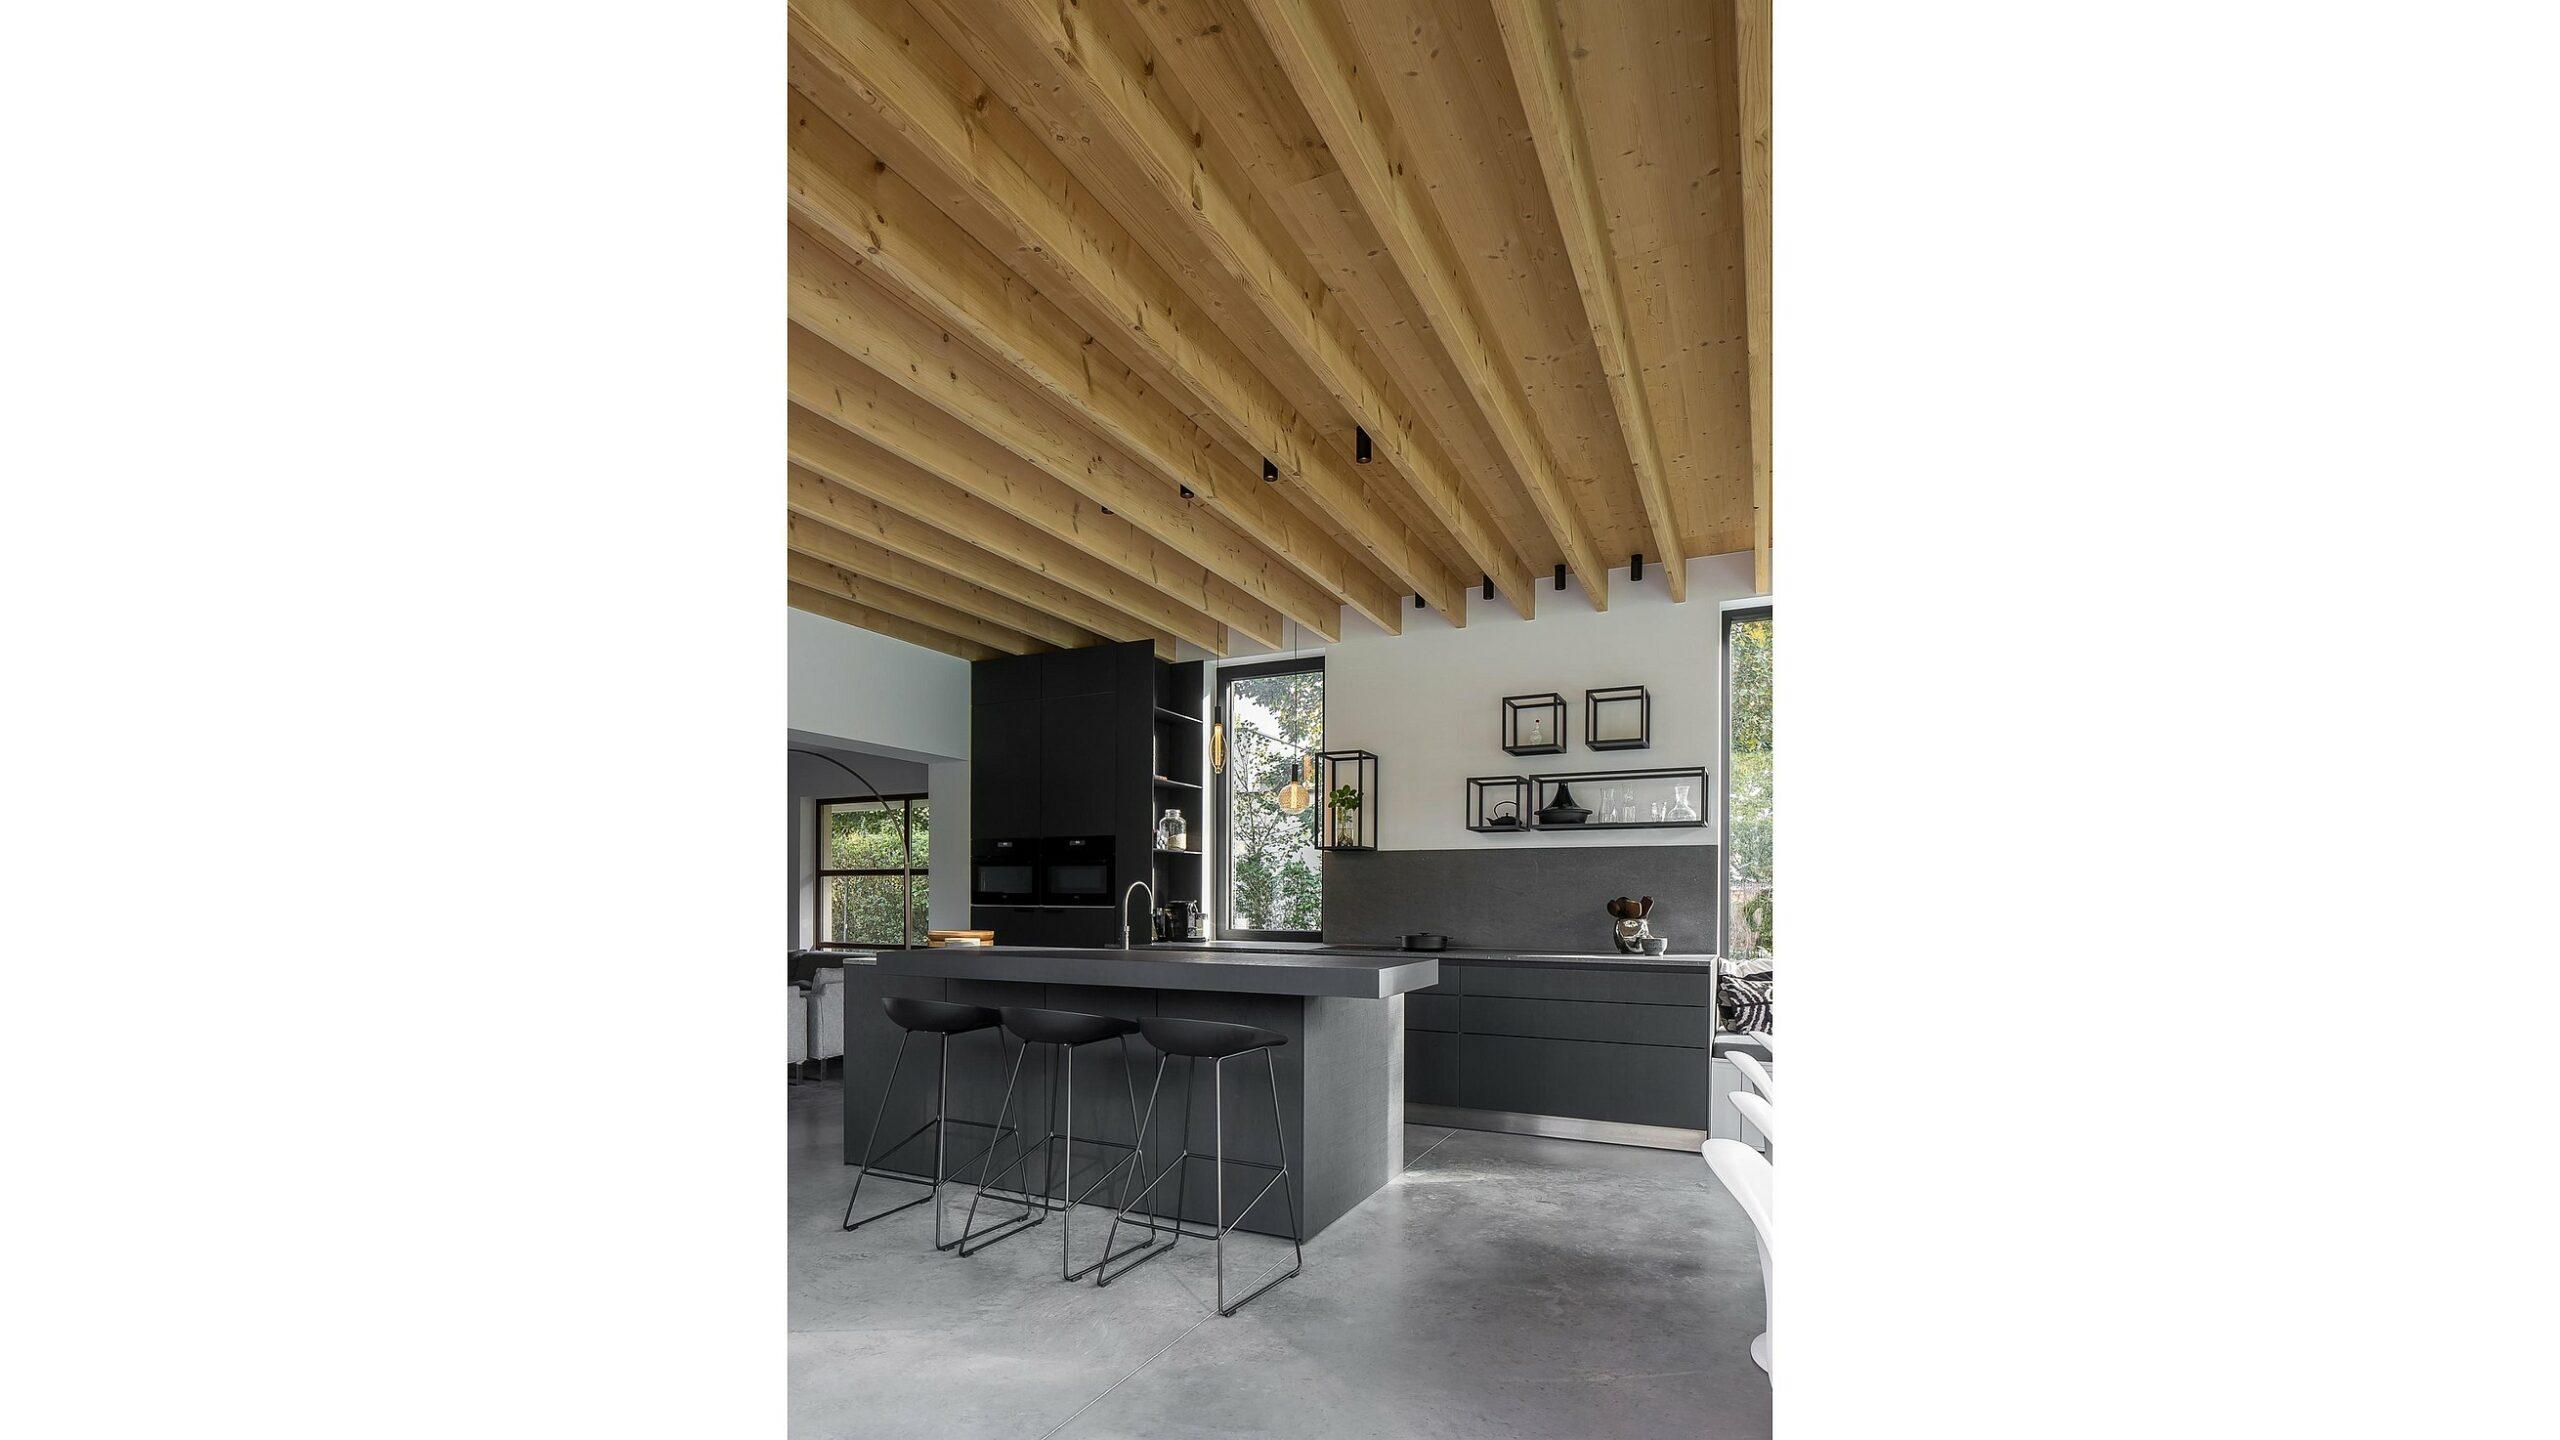 csm bulthaup ligna recta cafeine black oak 01 bb2a0d3fb8 1 scaled | Baeyens & Beck architecten Gent | architect nieuwbouw renovatie interieur | high end | architectenbureau